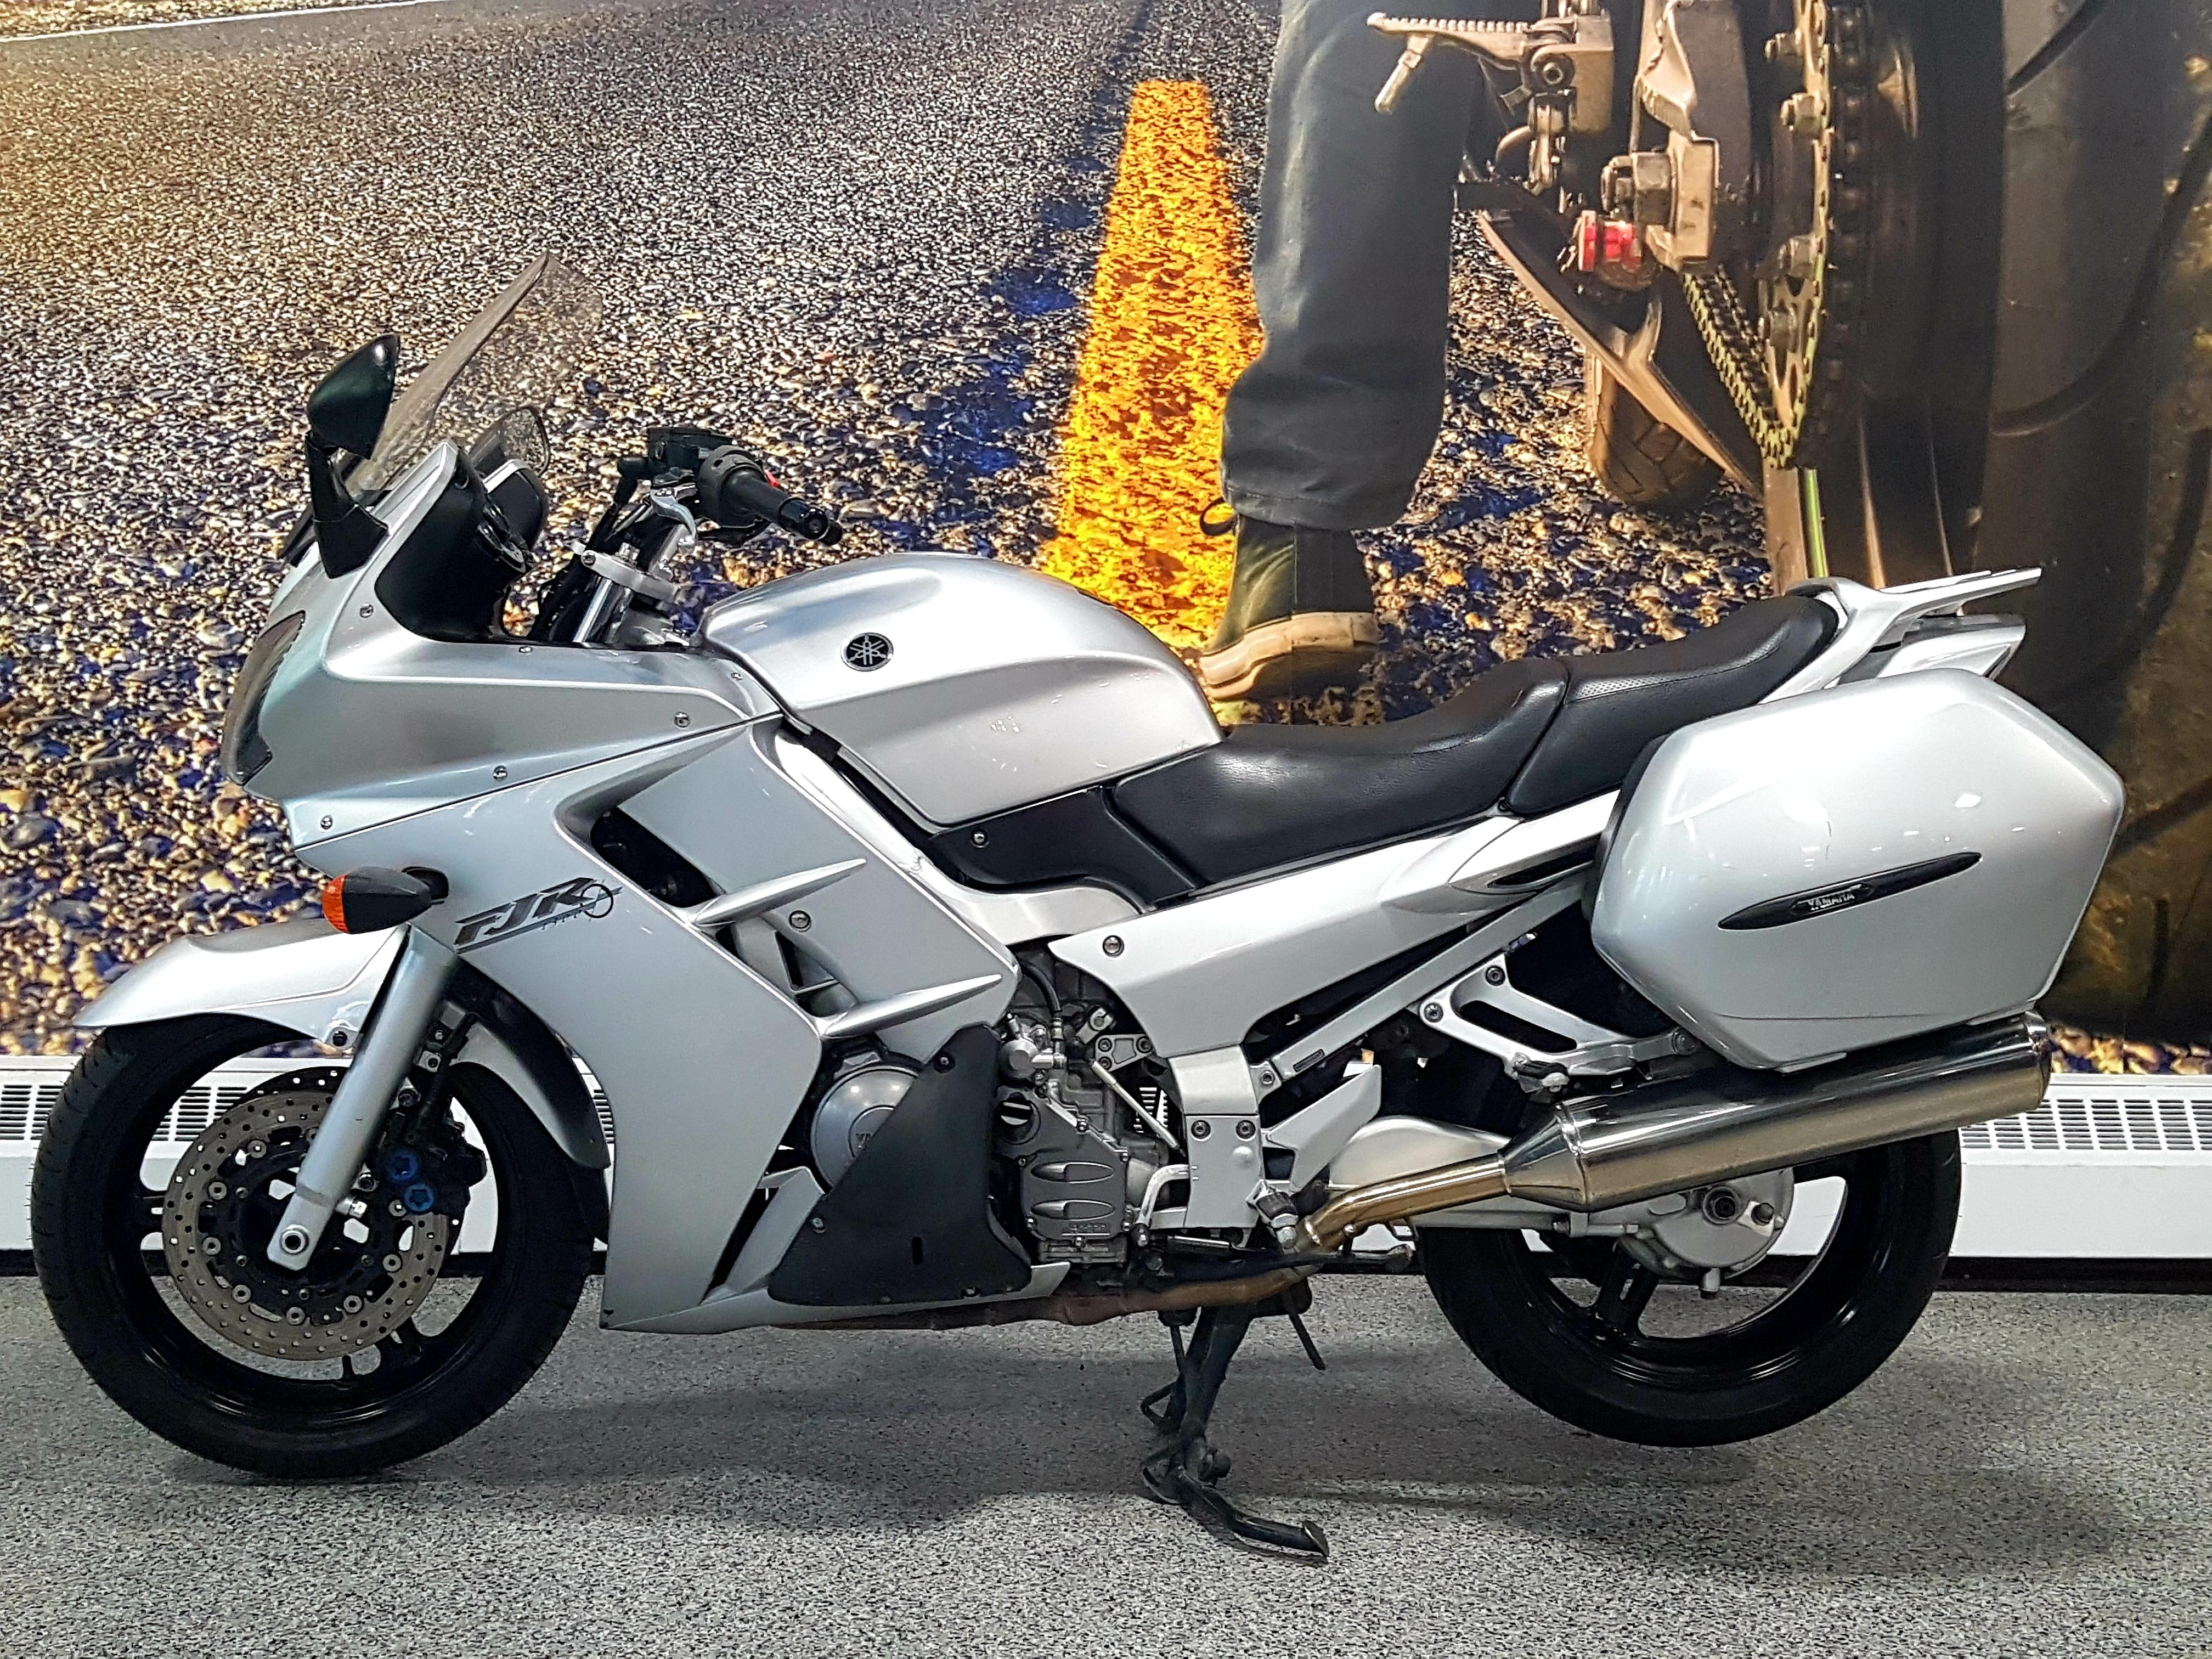 8873 Yamaha FJR1300 2003